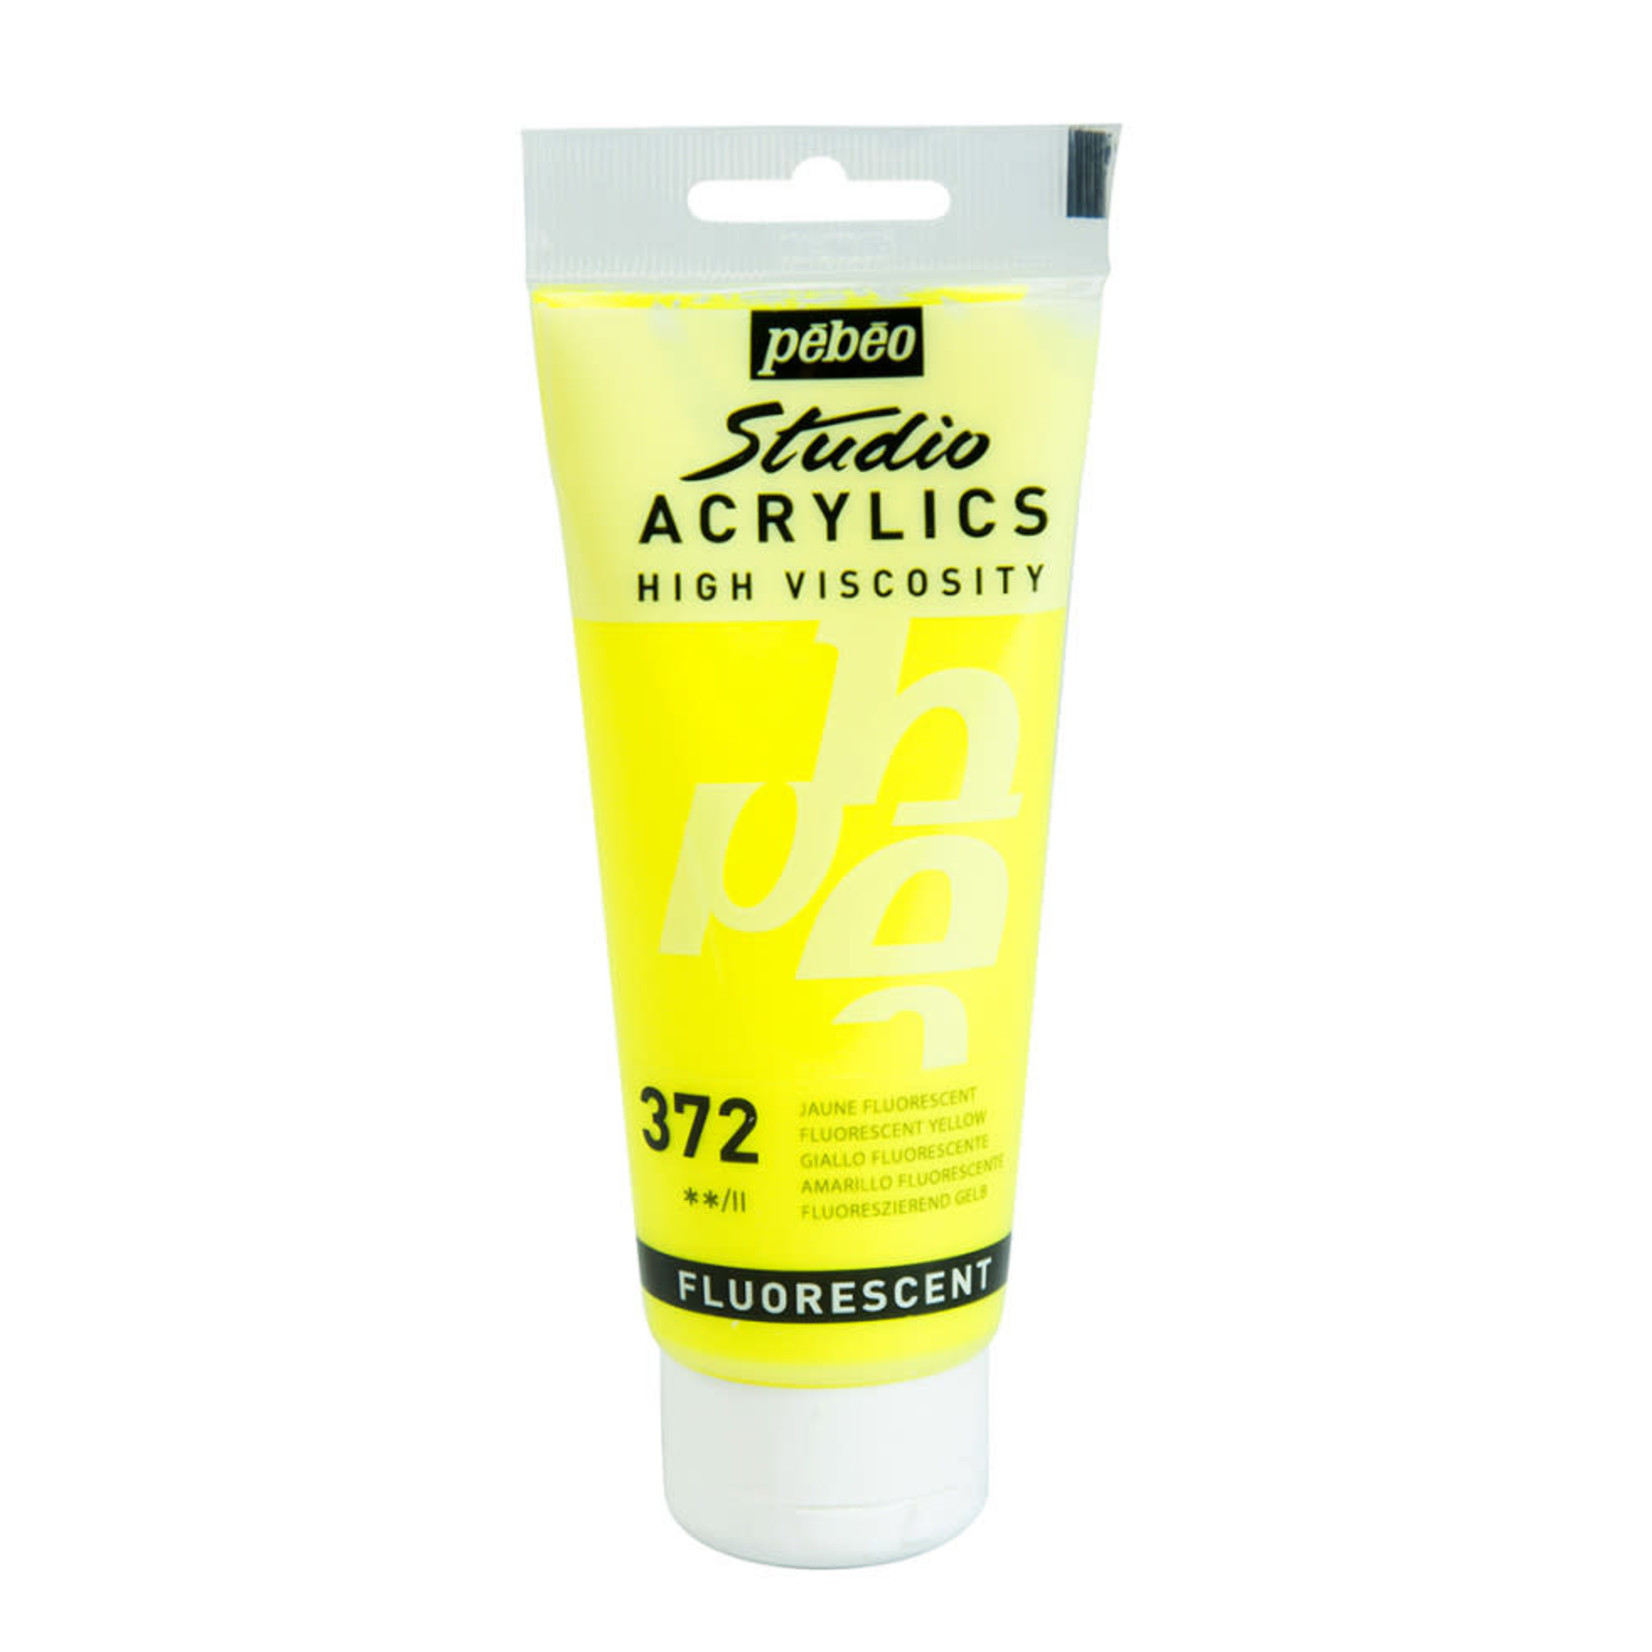 Pebeo Pebeo Acrylic Fluorescent Yellow